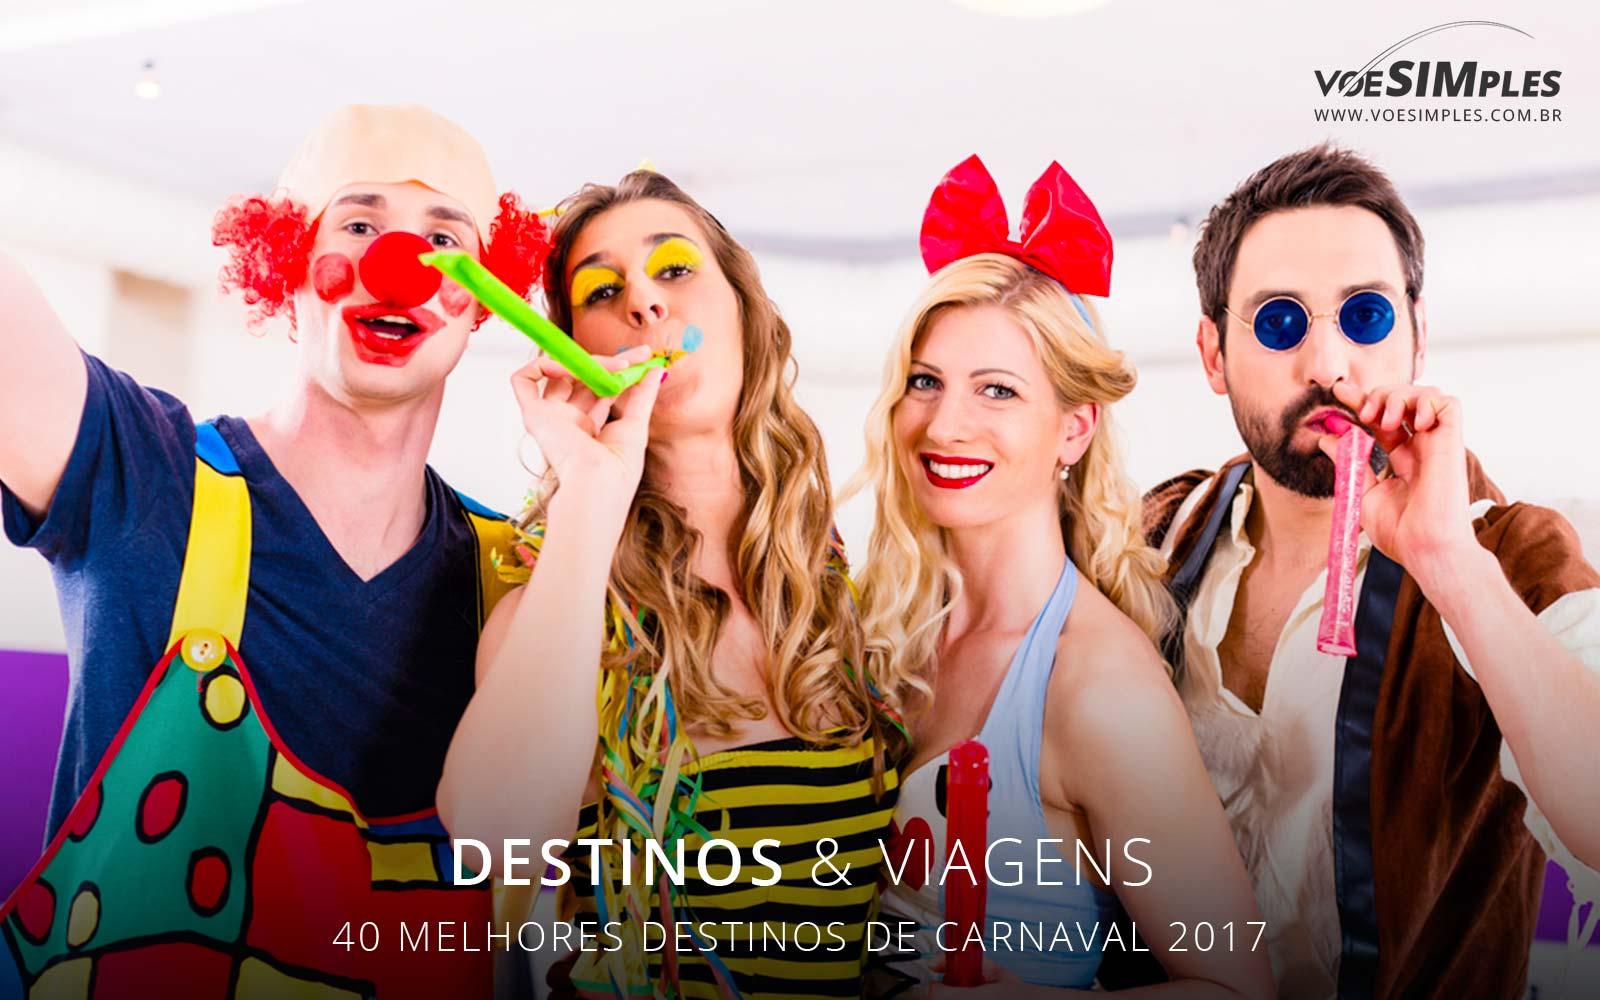 guia-carnaval-multi-destinos-2017-voesimples-passagens-aereas-promocionais-brasil-mundo-passagens-promo-multi-destinos-2017